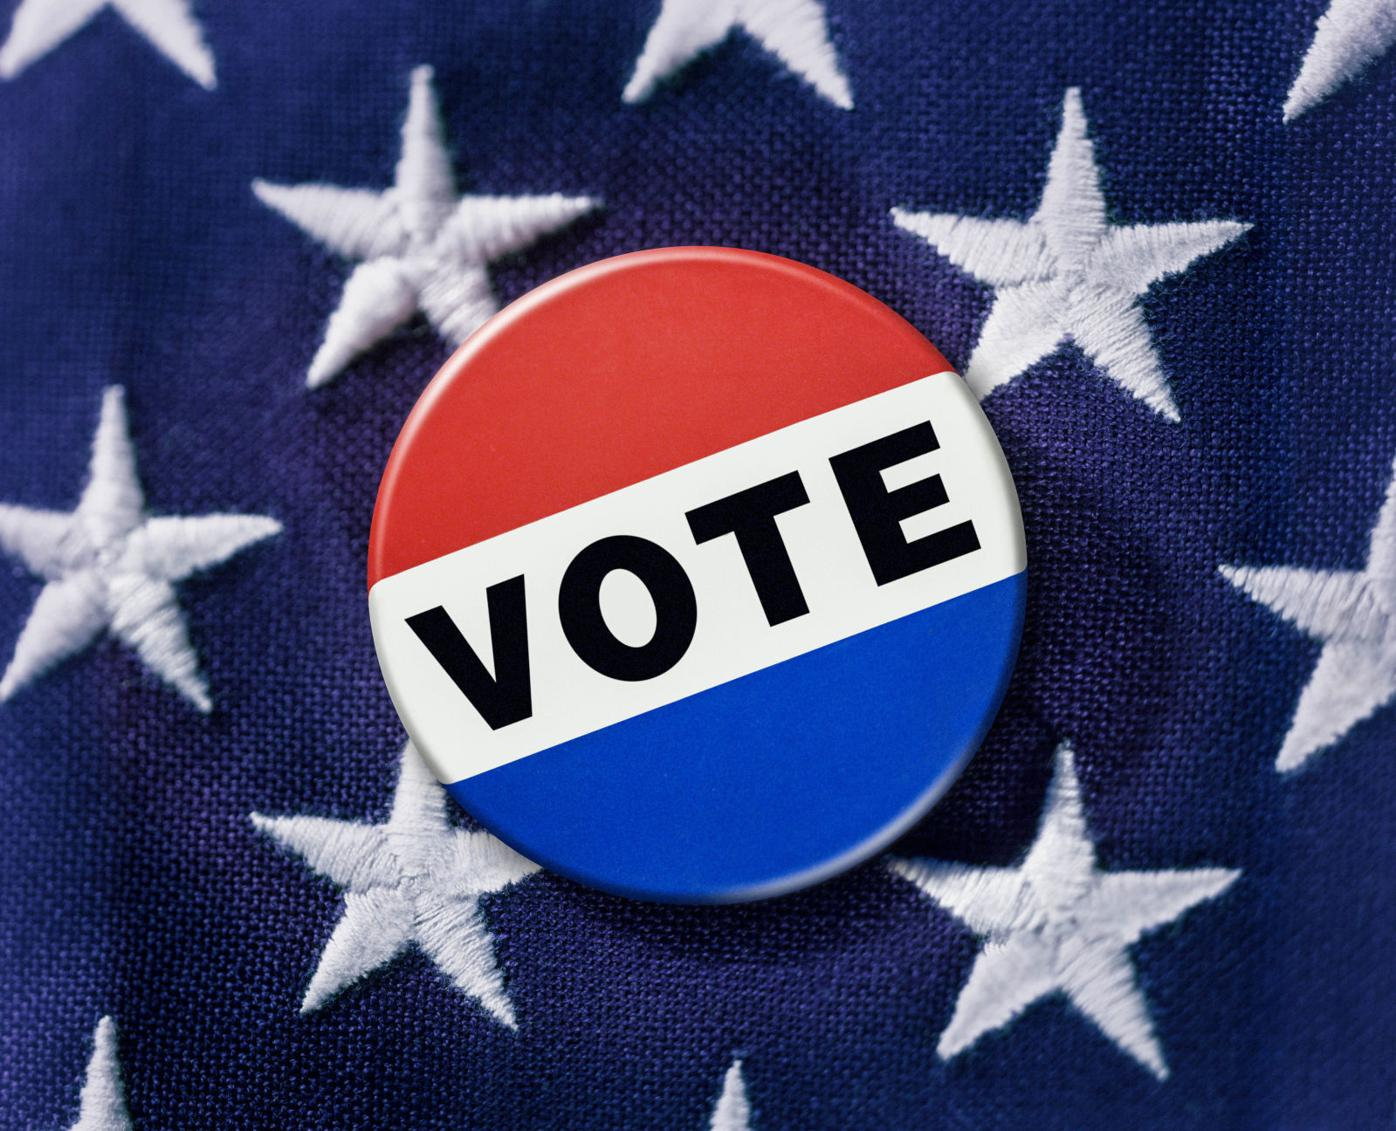 election vote.jpg